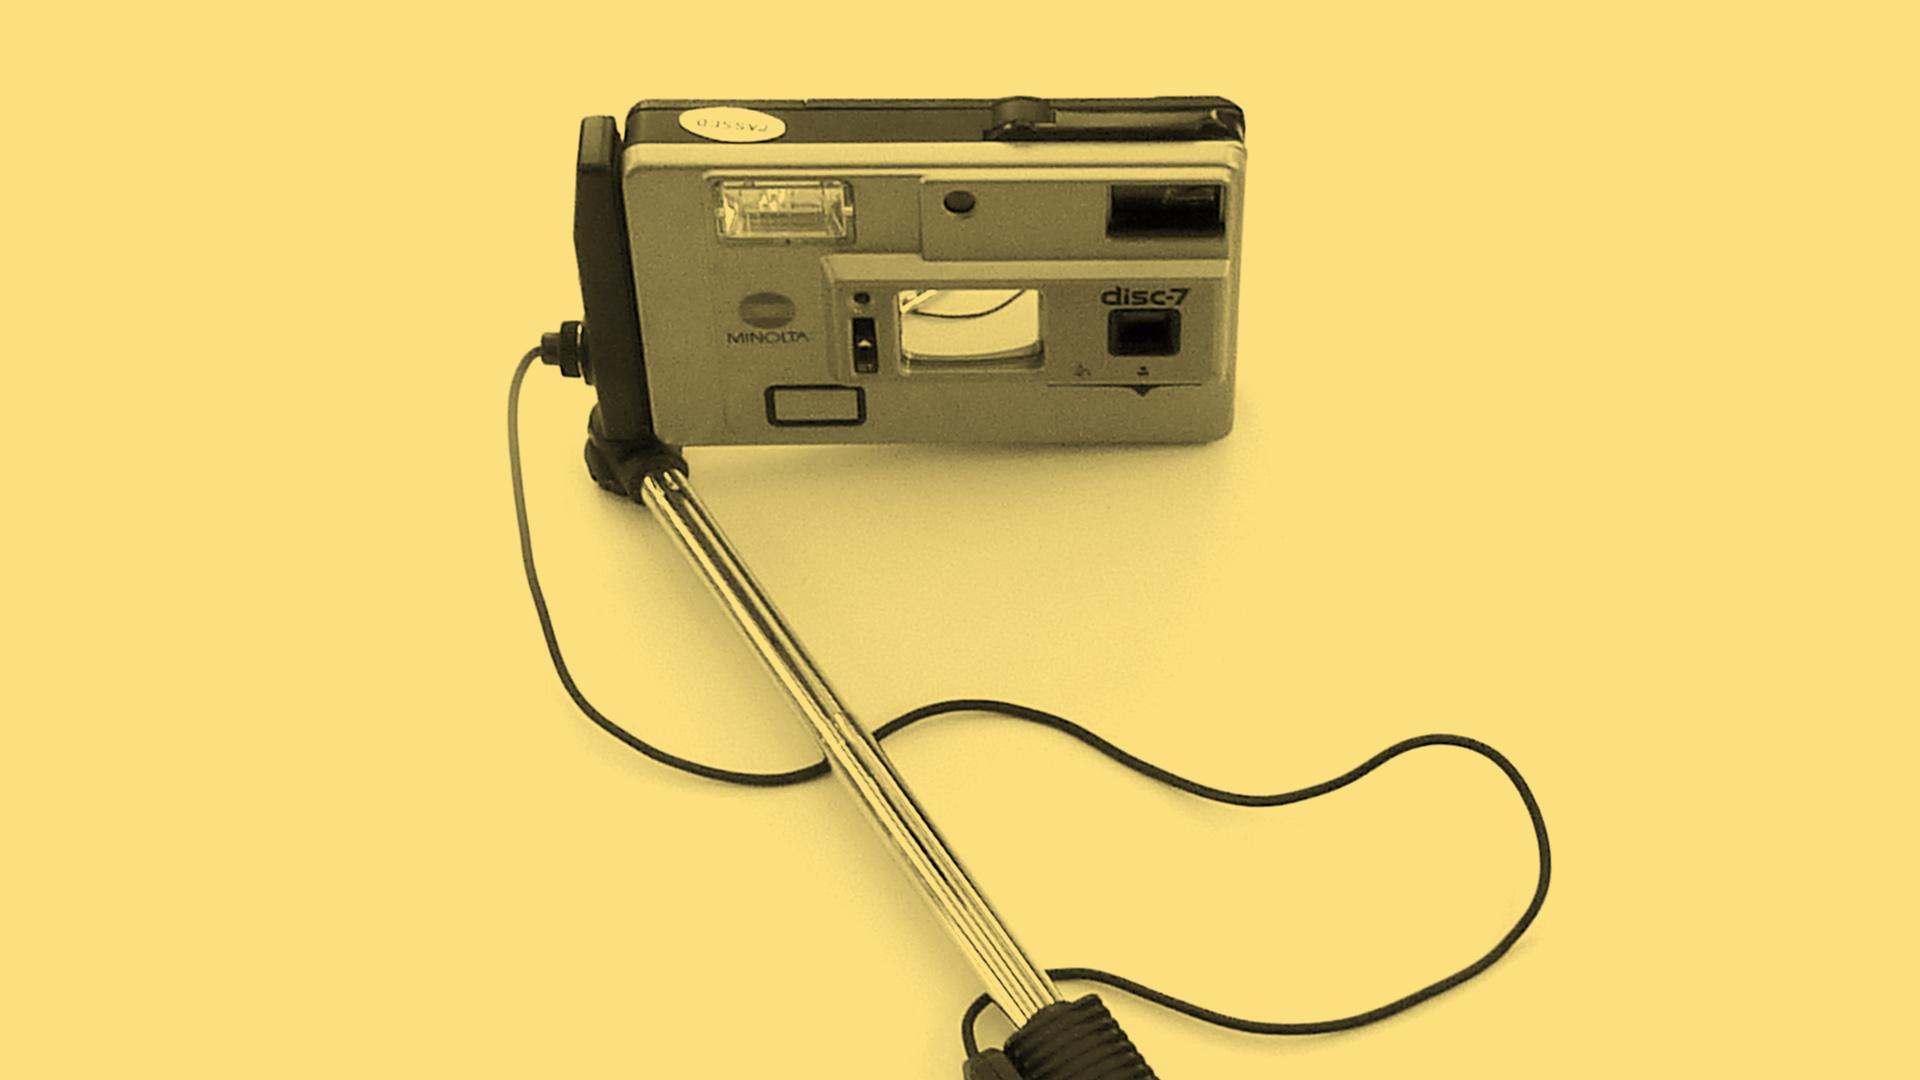 The Minolta 7 Disc camera mounted on its selfie stick